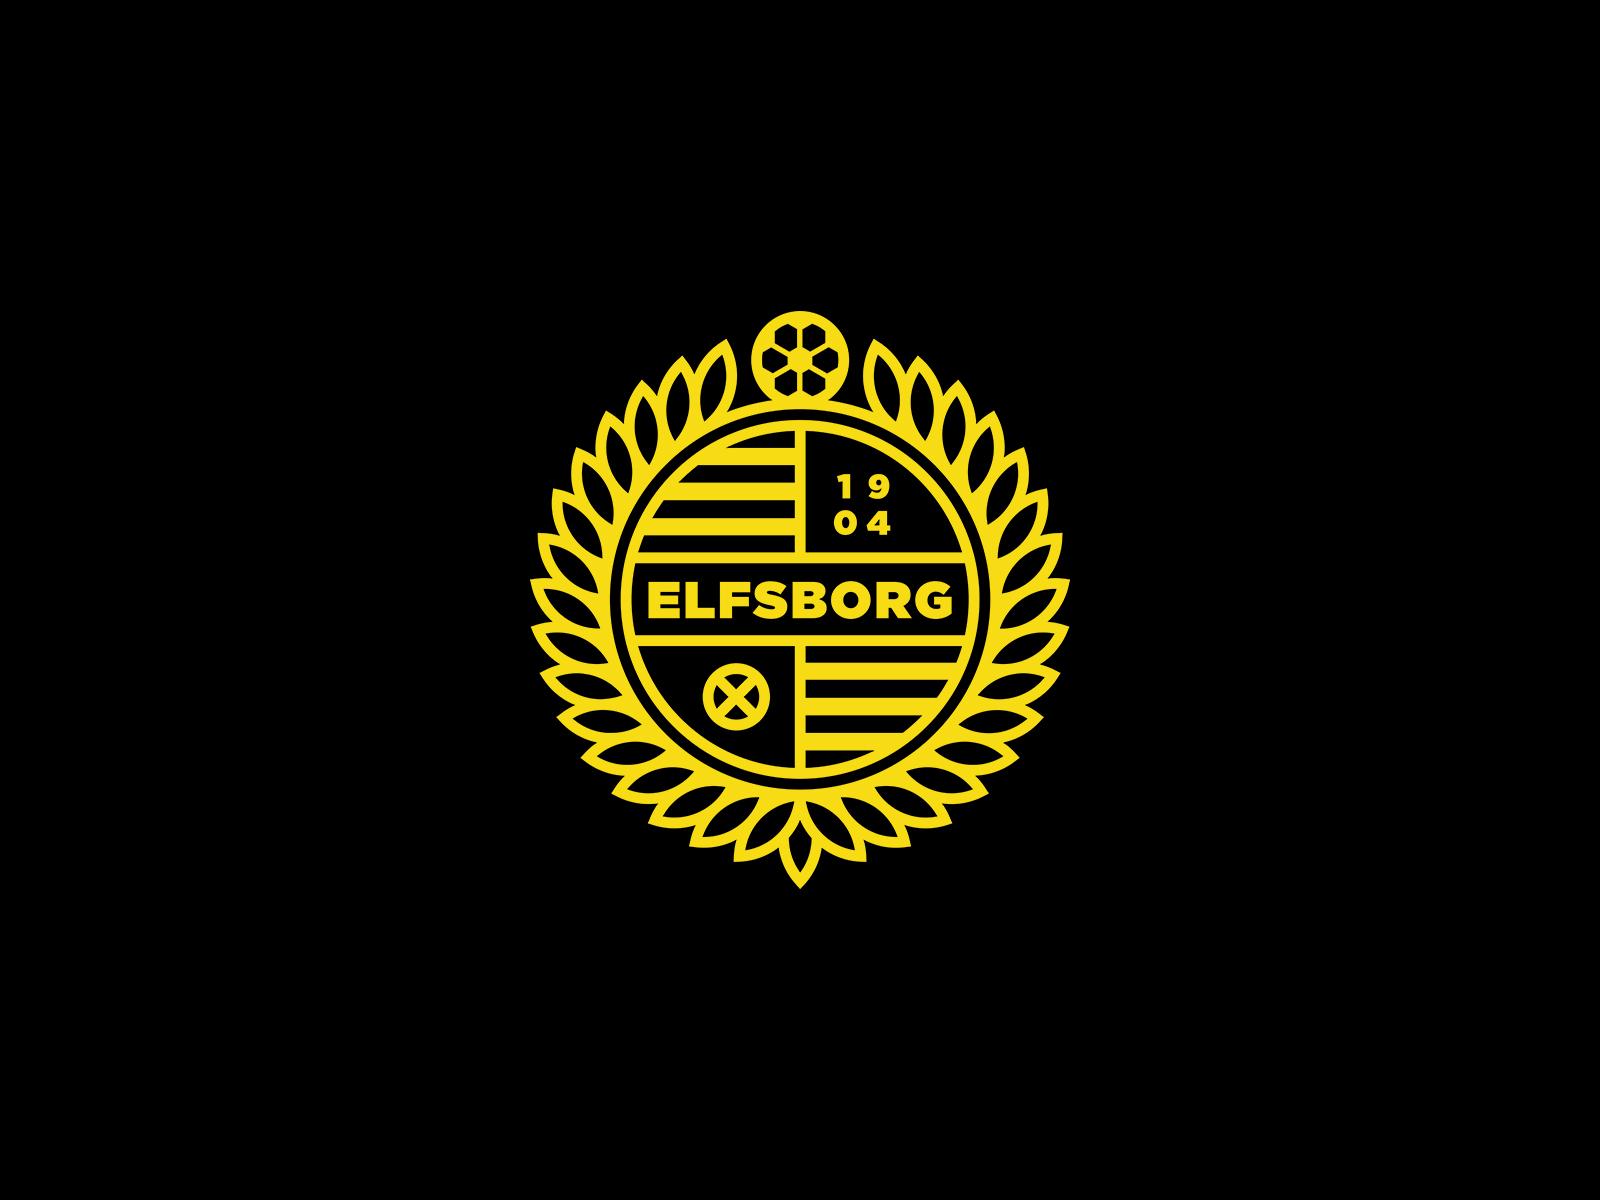 IF Elfsborg | Logo Redesign by Damjan on Dribbble